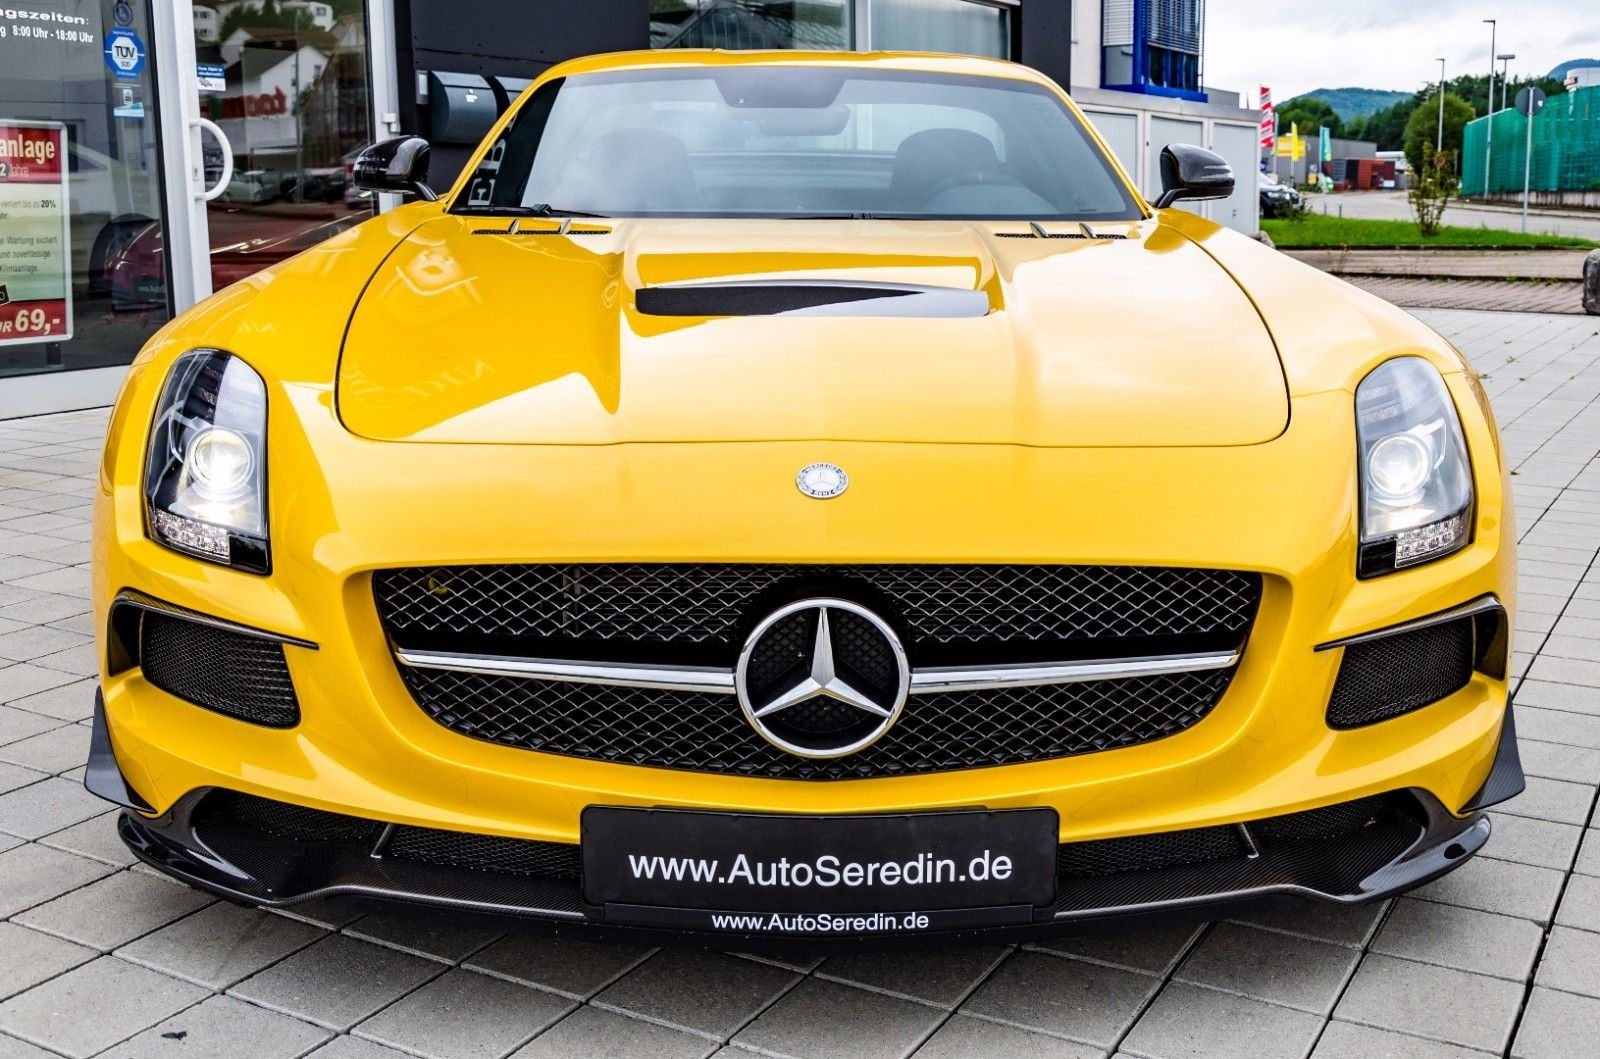 Mercedes Benz Sls Amg Blackseries Unfallfrei Solarbeam Export Price 750 000 Stosk B560 Fuel Consumption In Town Mercedes Benz Mercedes Benz